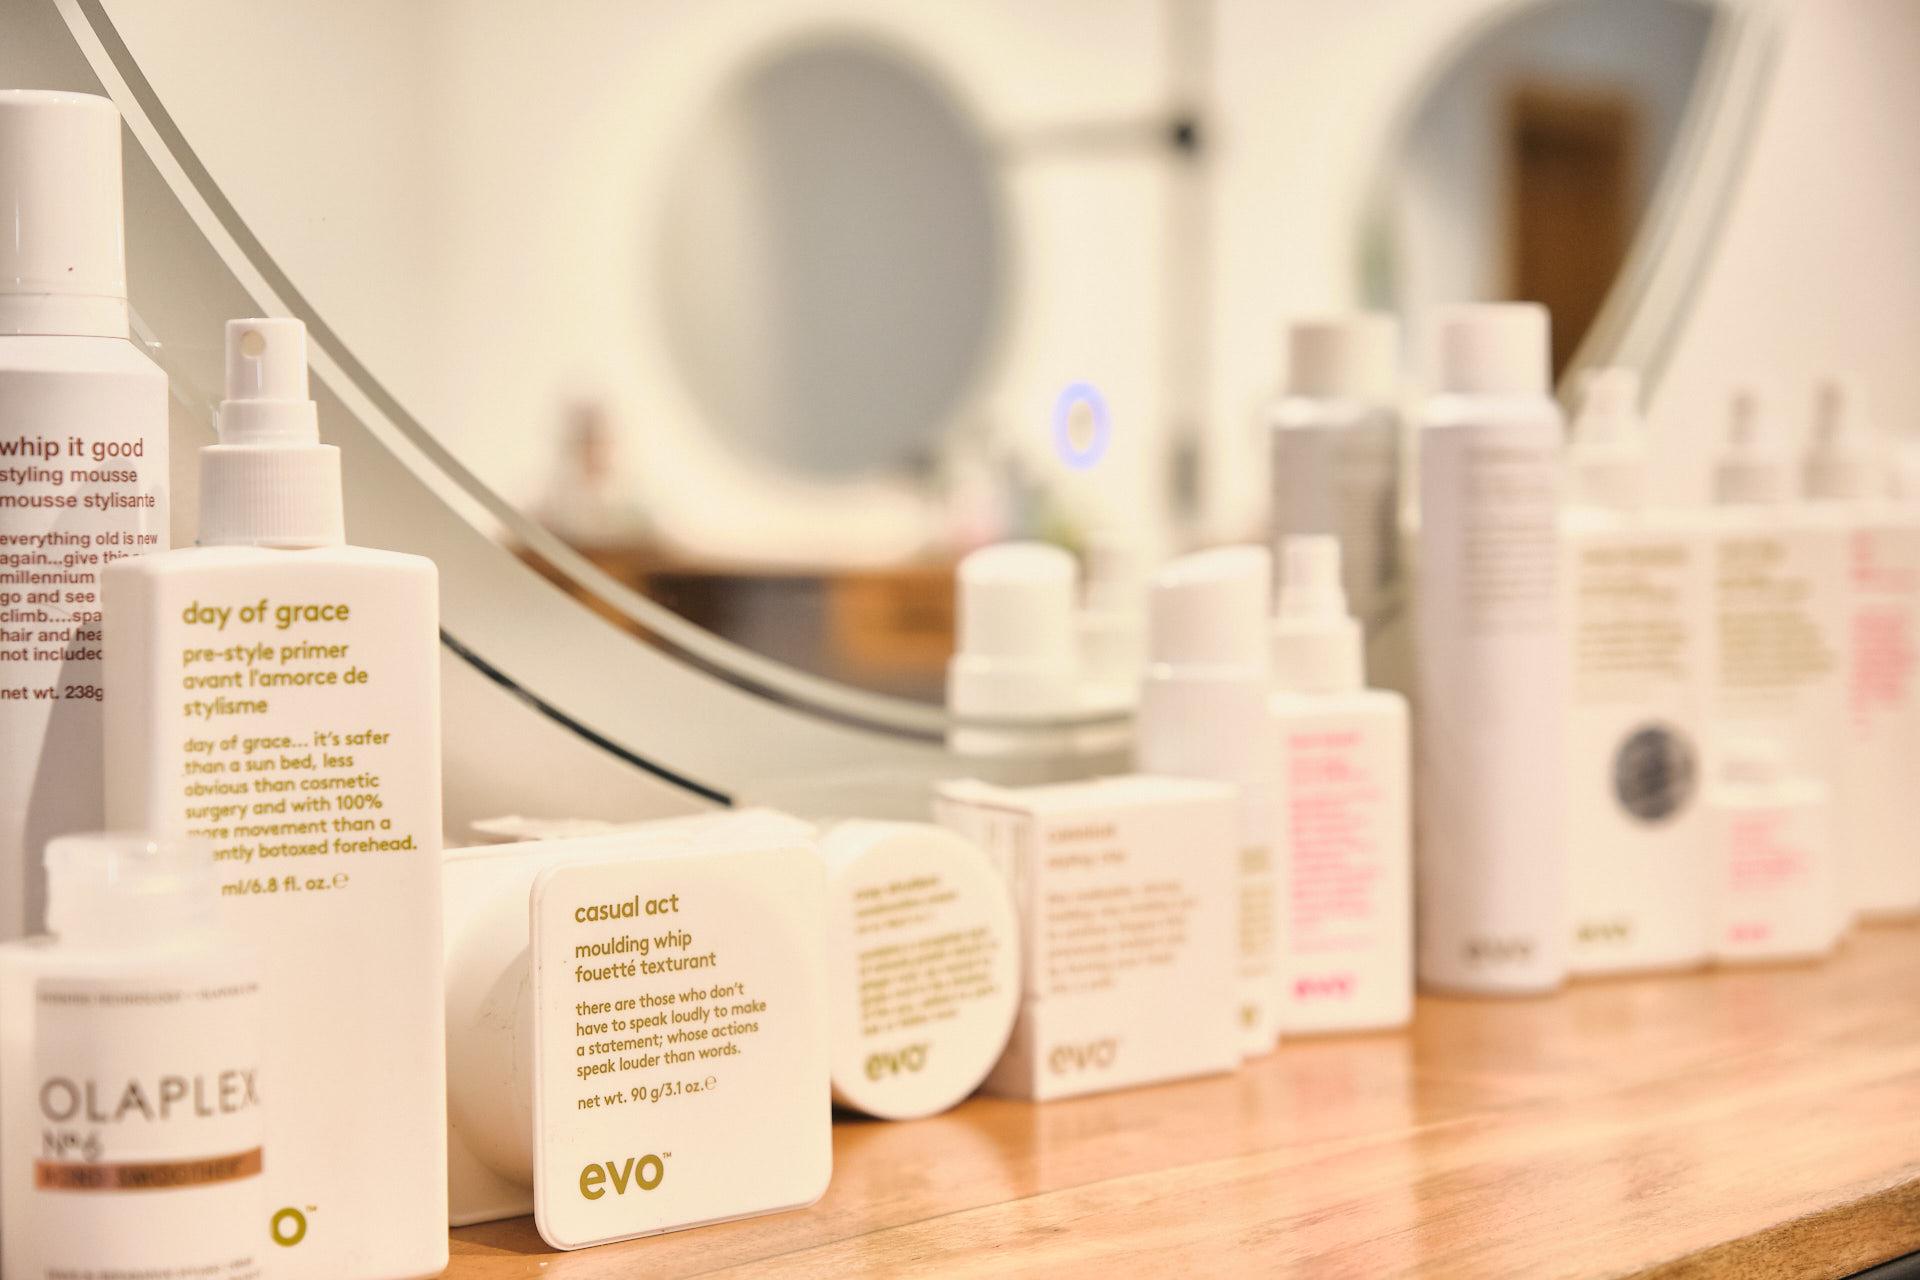 evo-maria-nila+hair+friseur+wien+newflag+flagshipstore+concept+store+ginger+lemon+hairspace+friseur+wien+salon+styling+olaplex.jpg